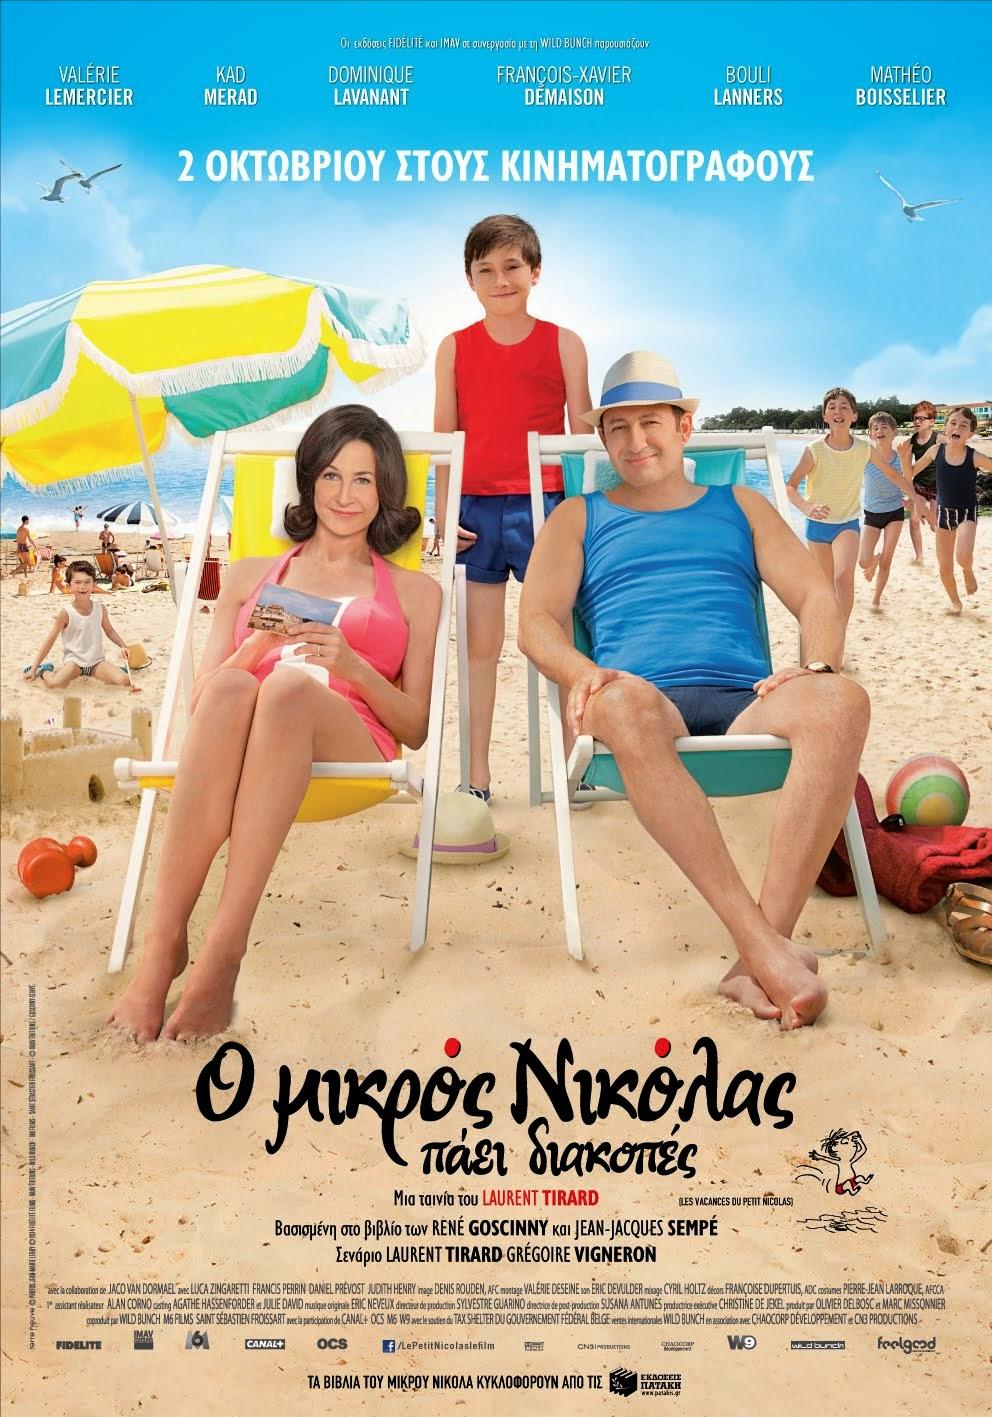 Les Vacances Du Petit Nicolas / ο μικρος νικολας παει διακοπες (2014) Dvdrip με ελληνικους υποτιτλους